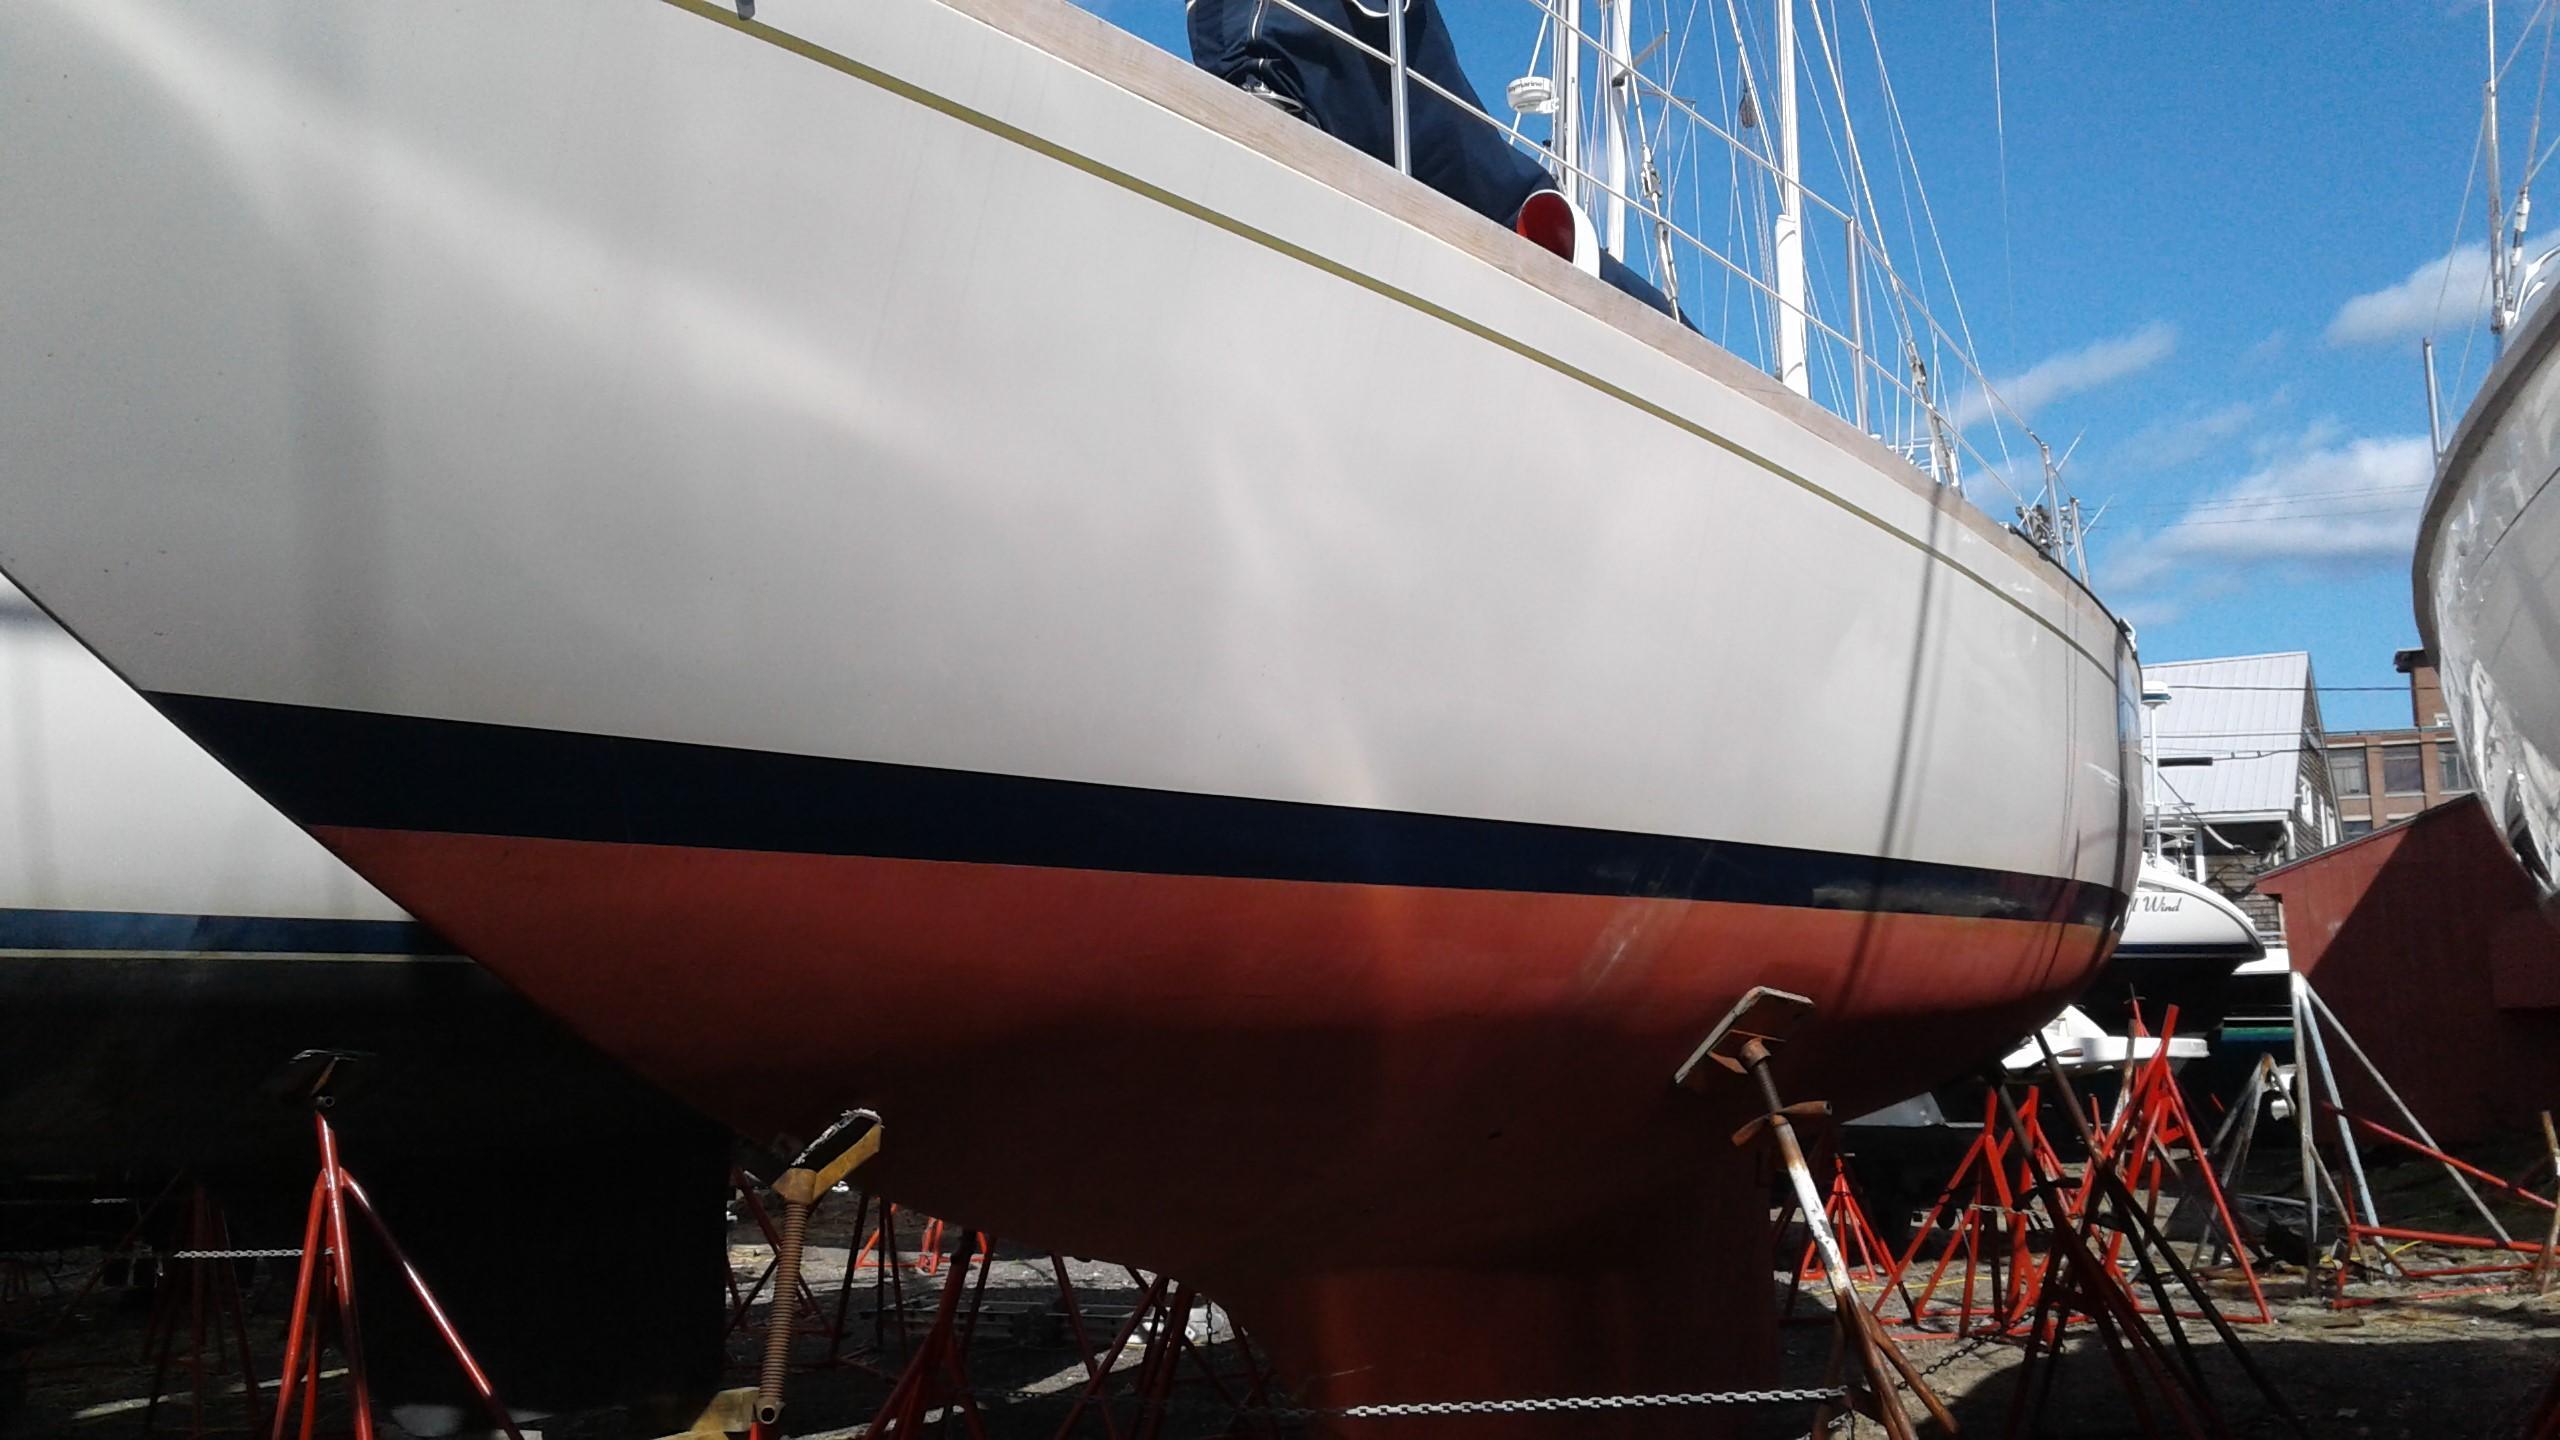 Segelyacht DeDood 1965 Yachten & Kielboote Bootsport